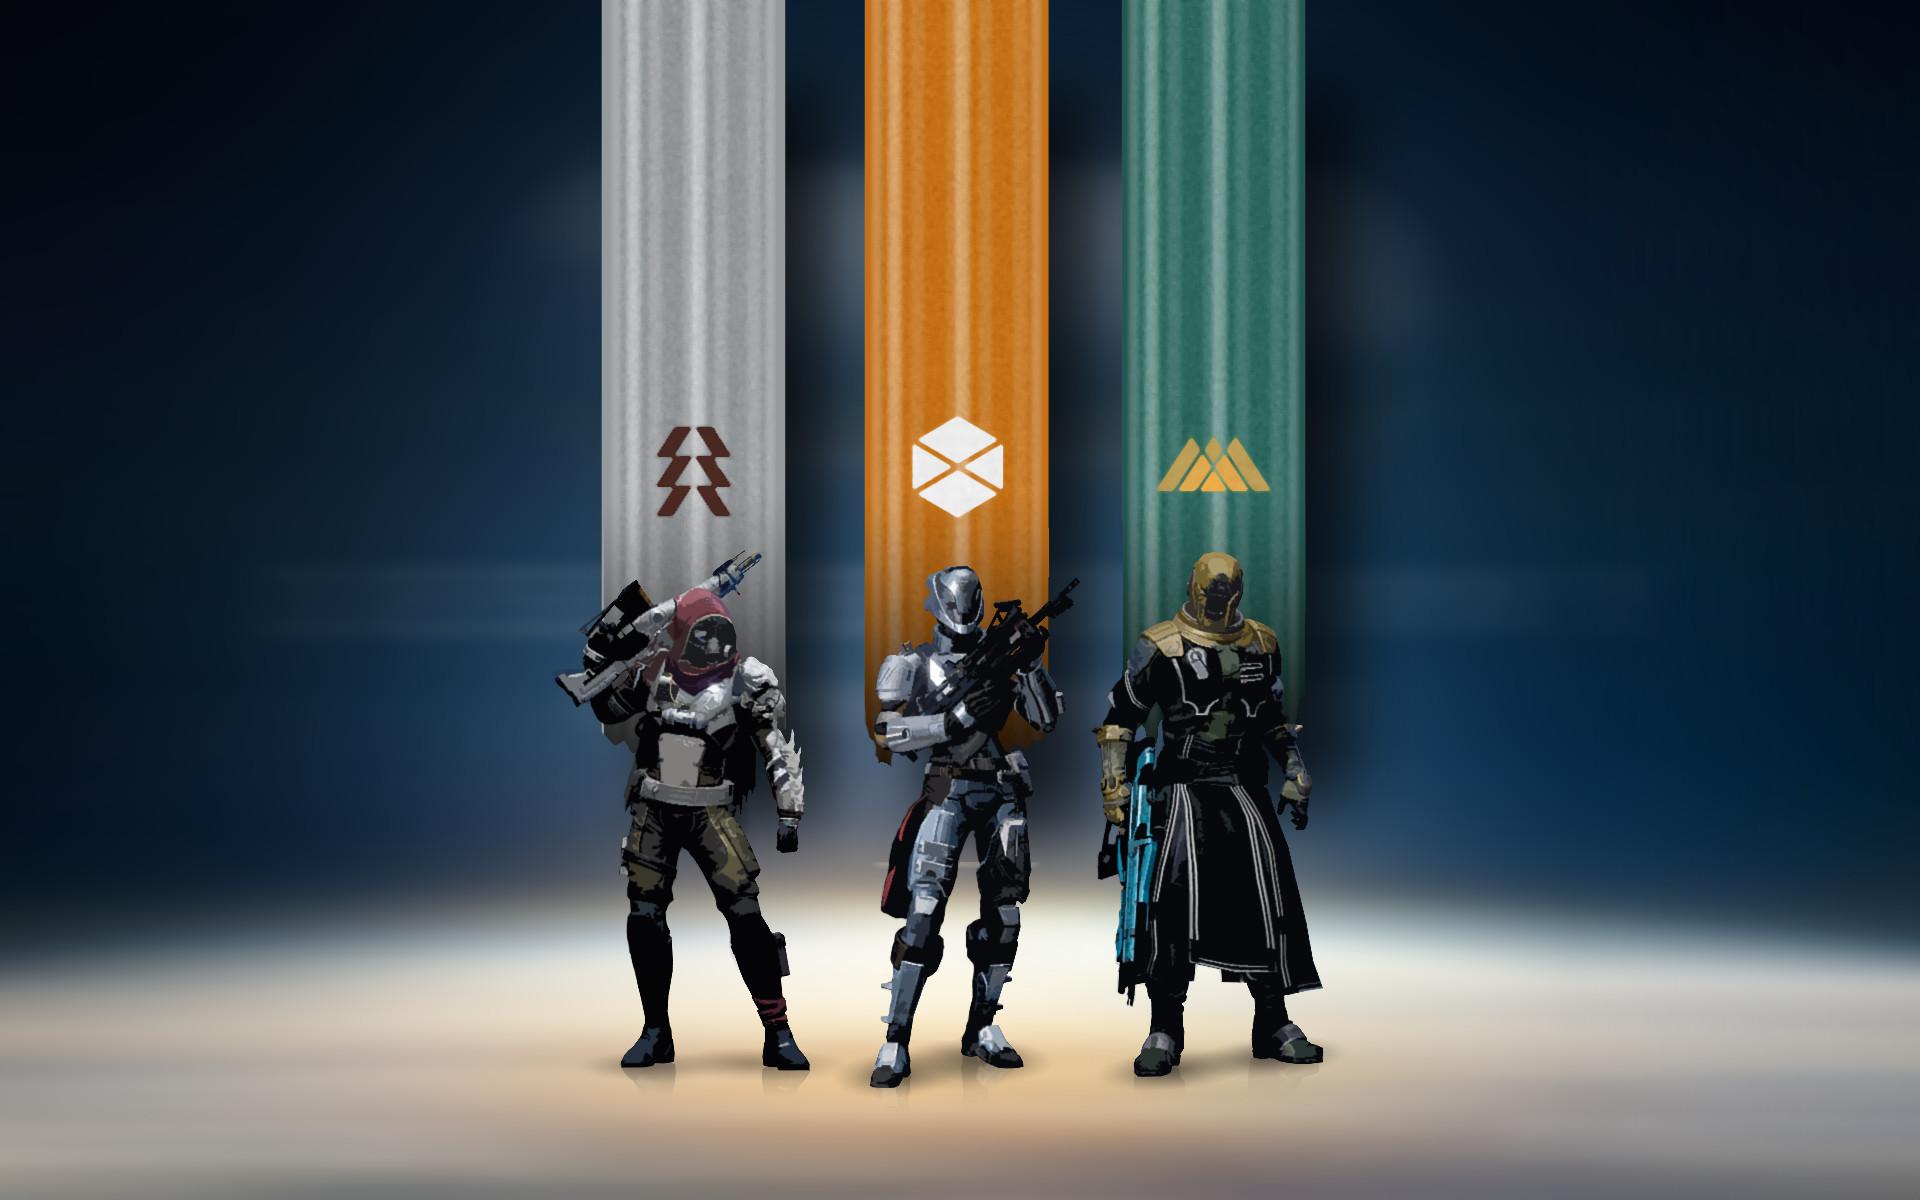 Awesome Destiny Wallpaper